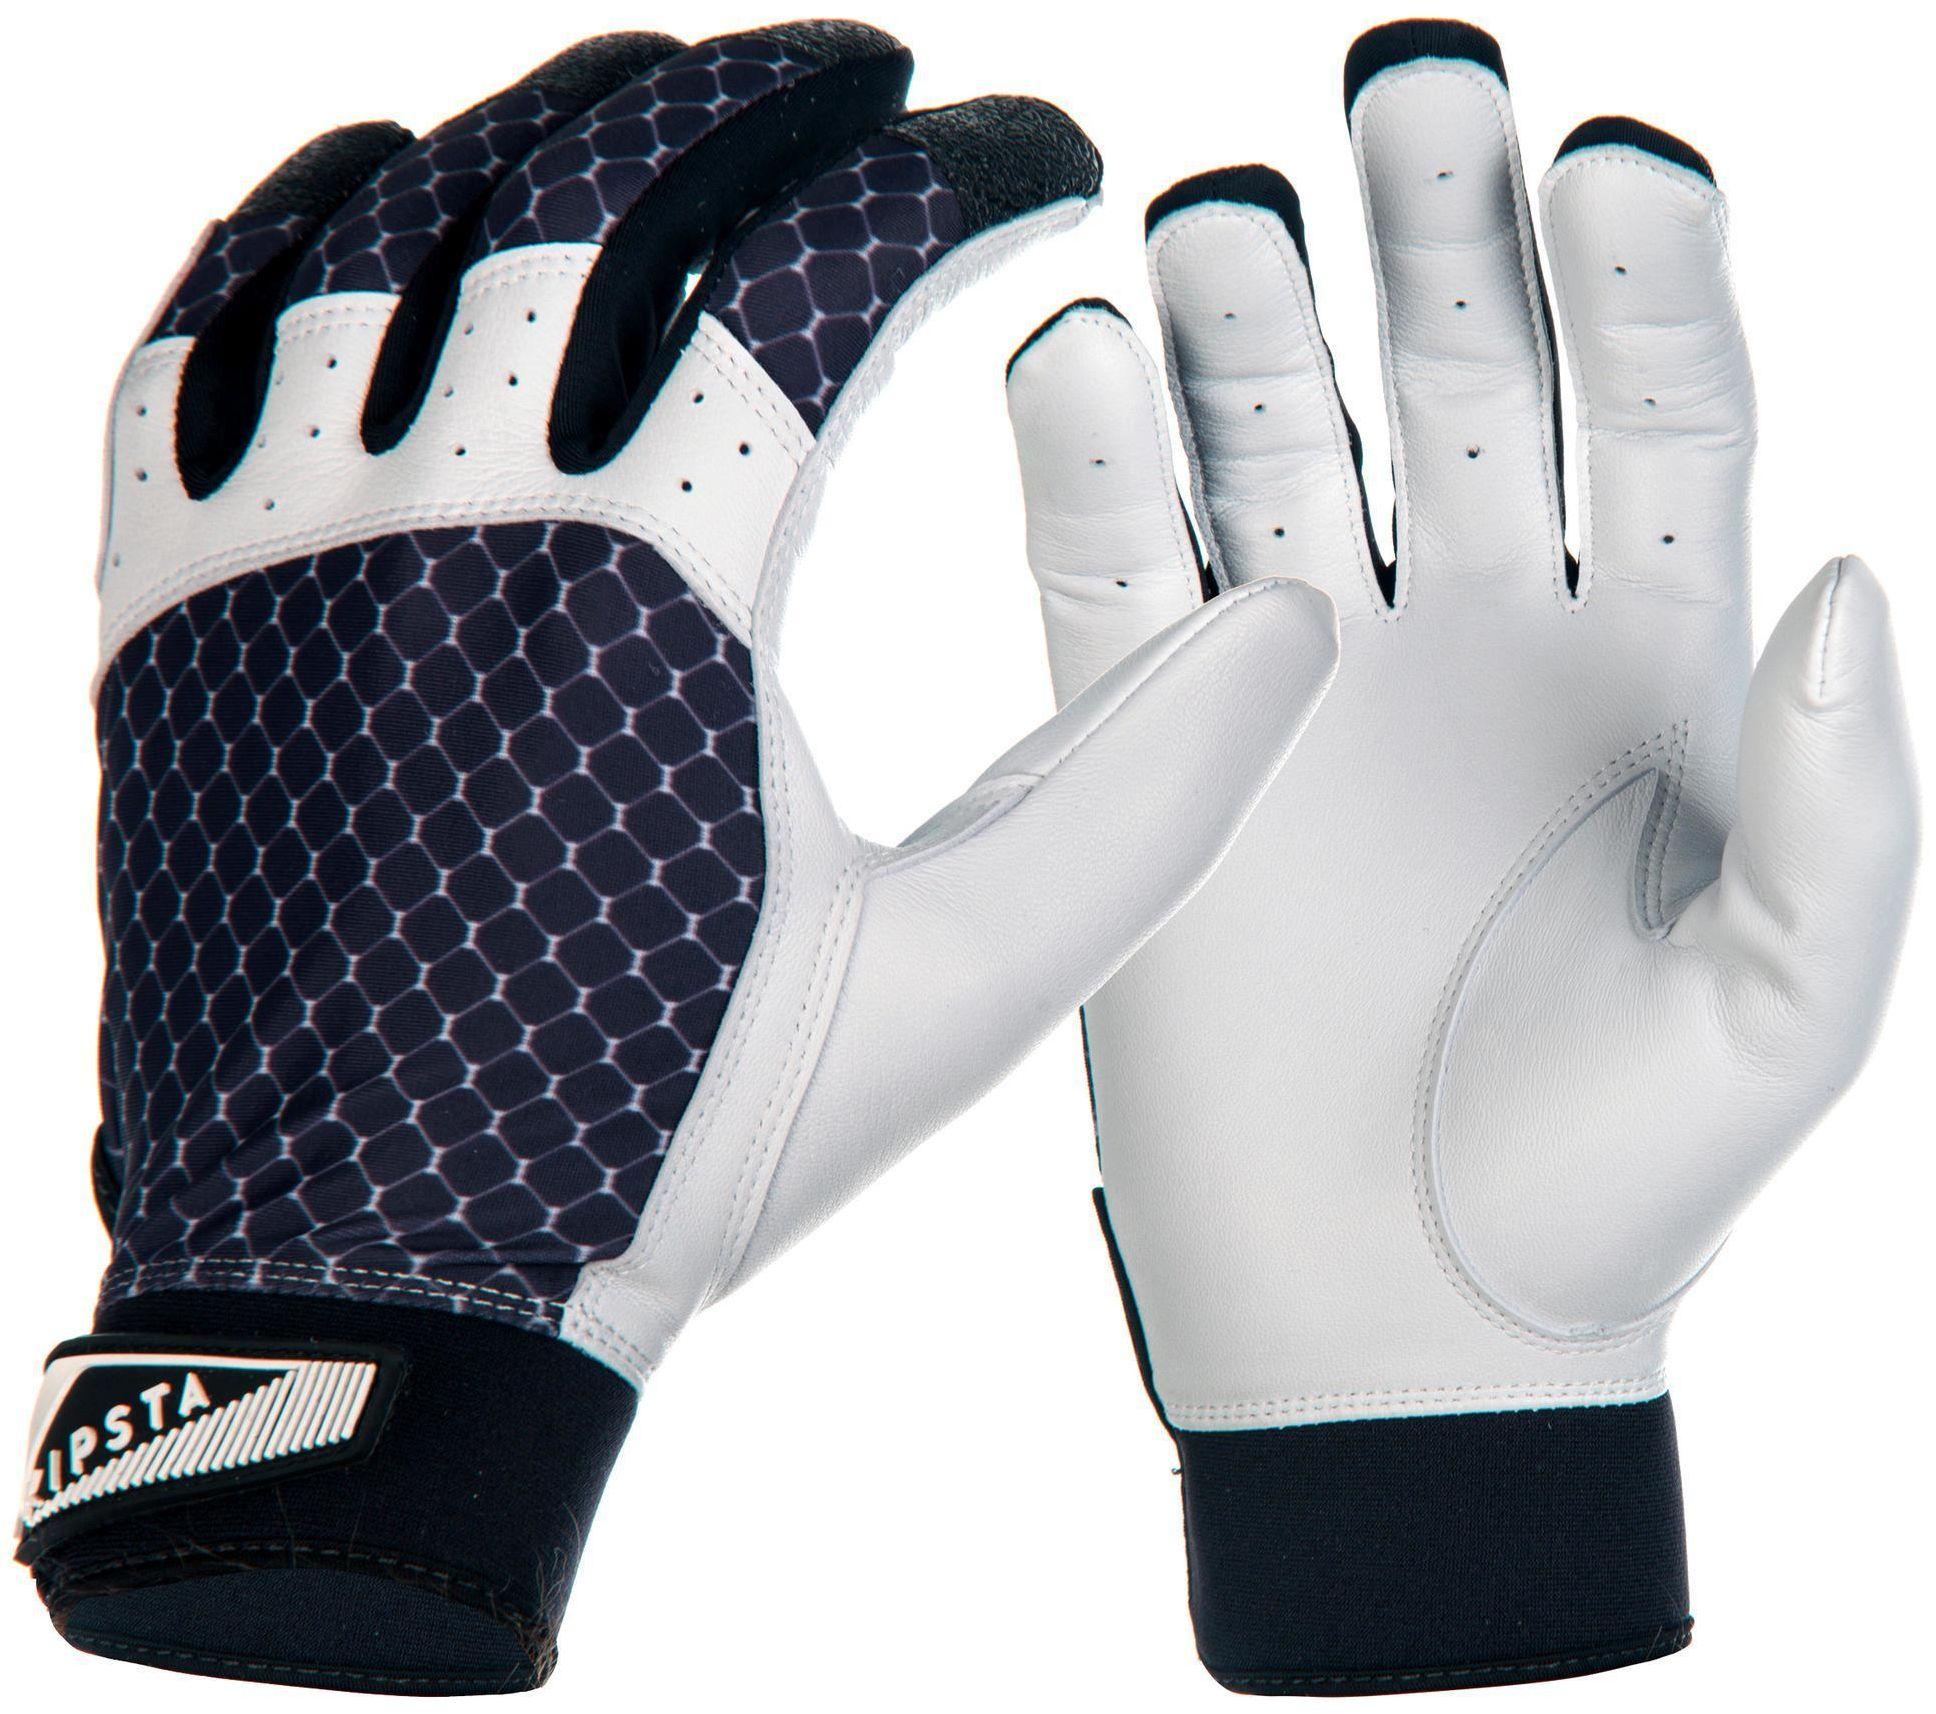 Rękawice baseball dla battera BA 550